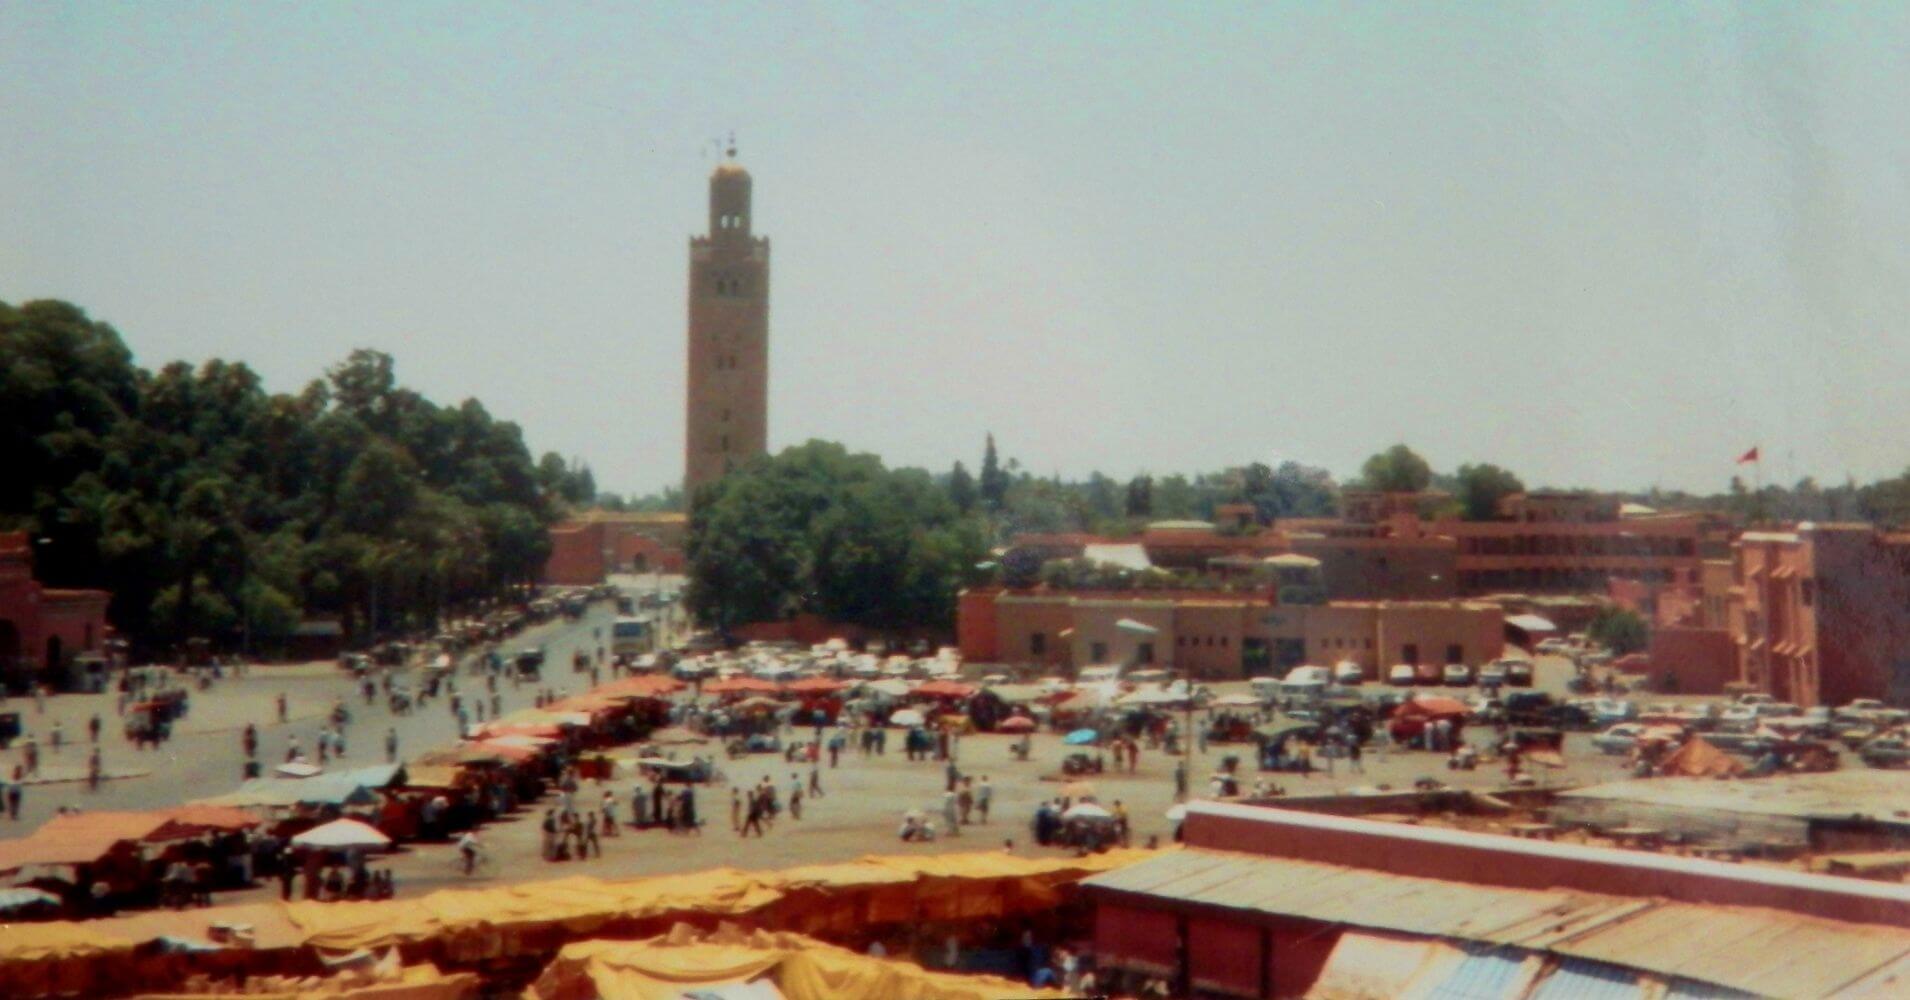 Plaza de Marrakech y la Mezquita Koutoubia. Marruecos.